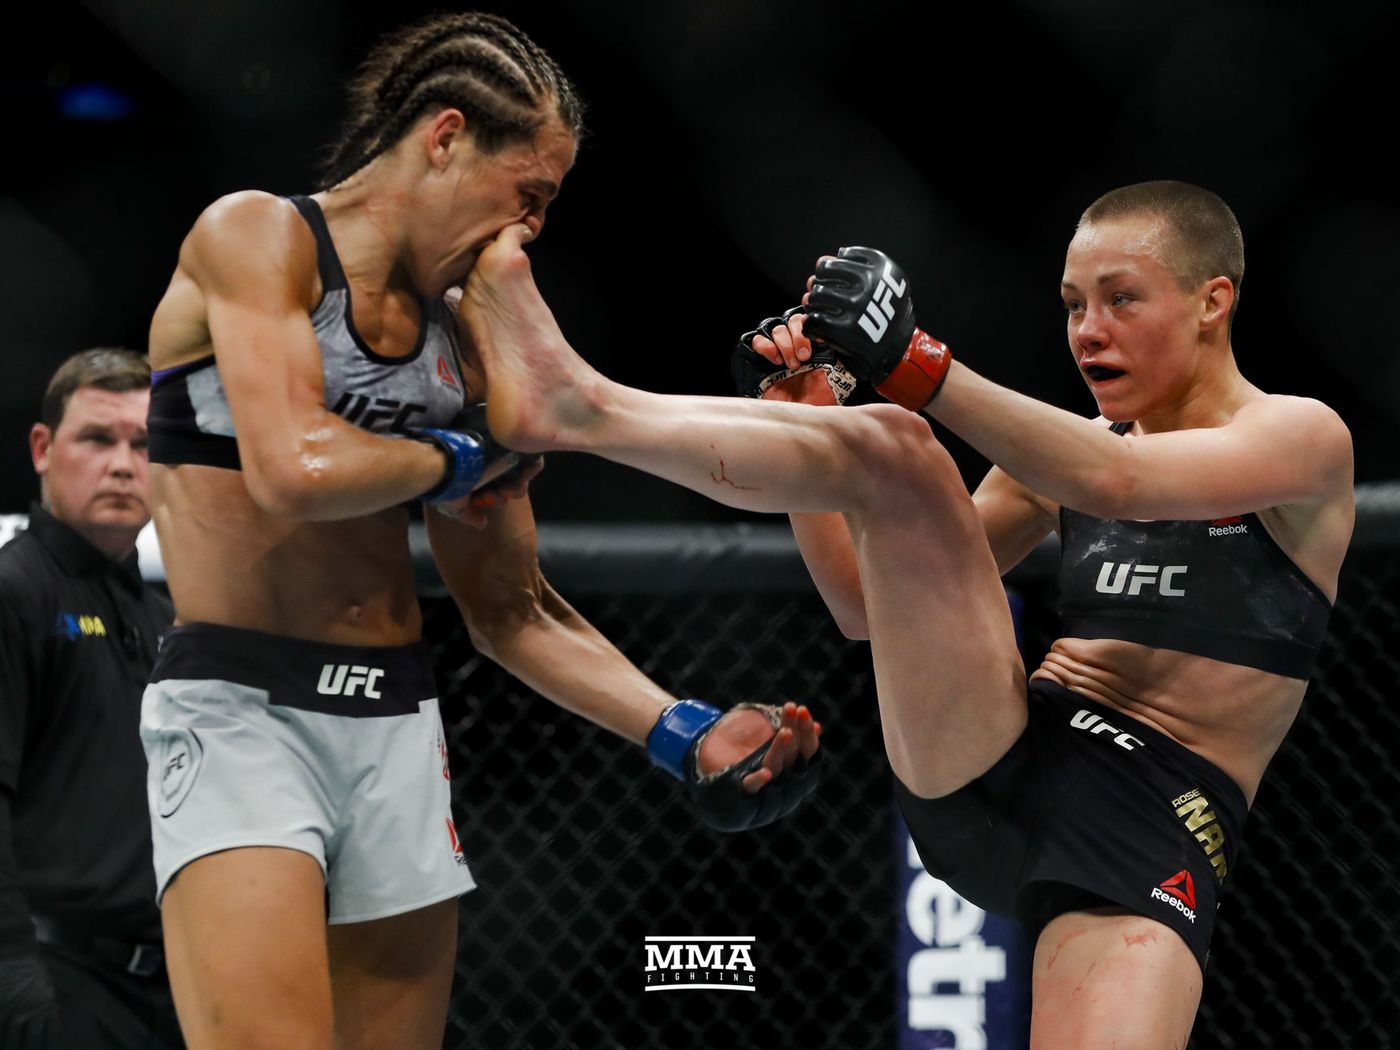 UFC 223 results: Rose Namajunas wins rematch over Joanna ...